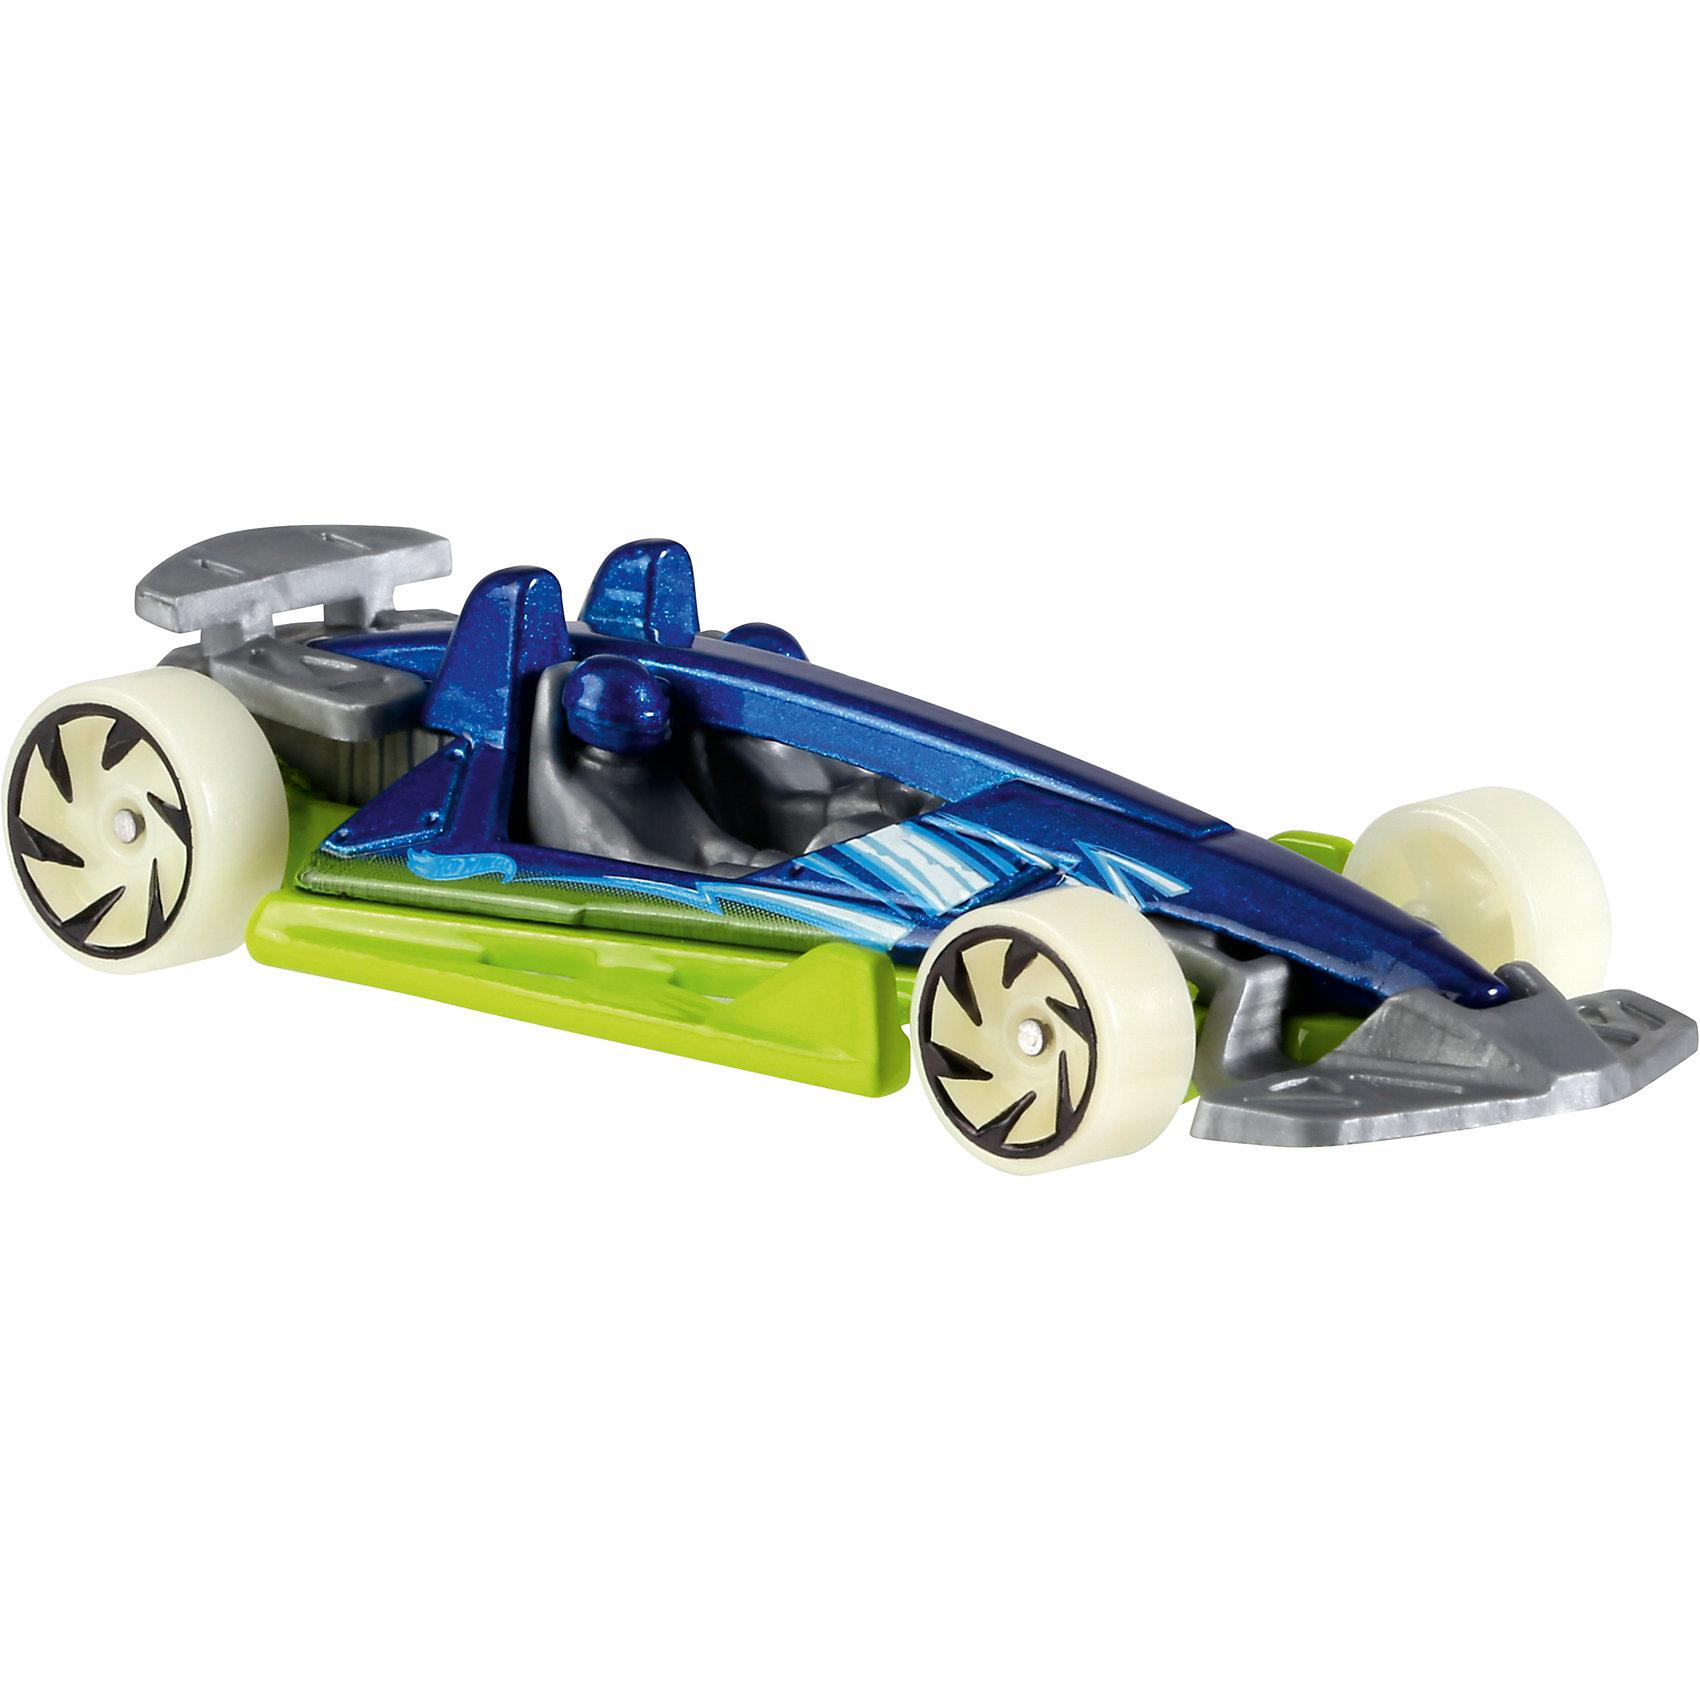 Базовая машинка Hot Wheels, Track HammerПопулярные игрушки<br><br><br>Ширина мм: 110<br>Глубина мм: 45<br>Высота мм: 110<br>Вес г: 30<br>Возраст от месяцев: 36<br>Возраст до месяцев: 96<br>Пол: Мужской<br>Возраст: Детский<br>SKU: 7111108